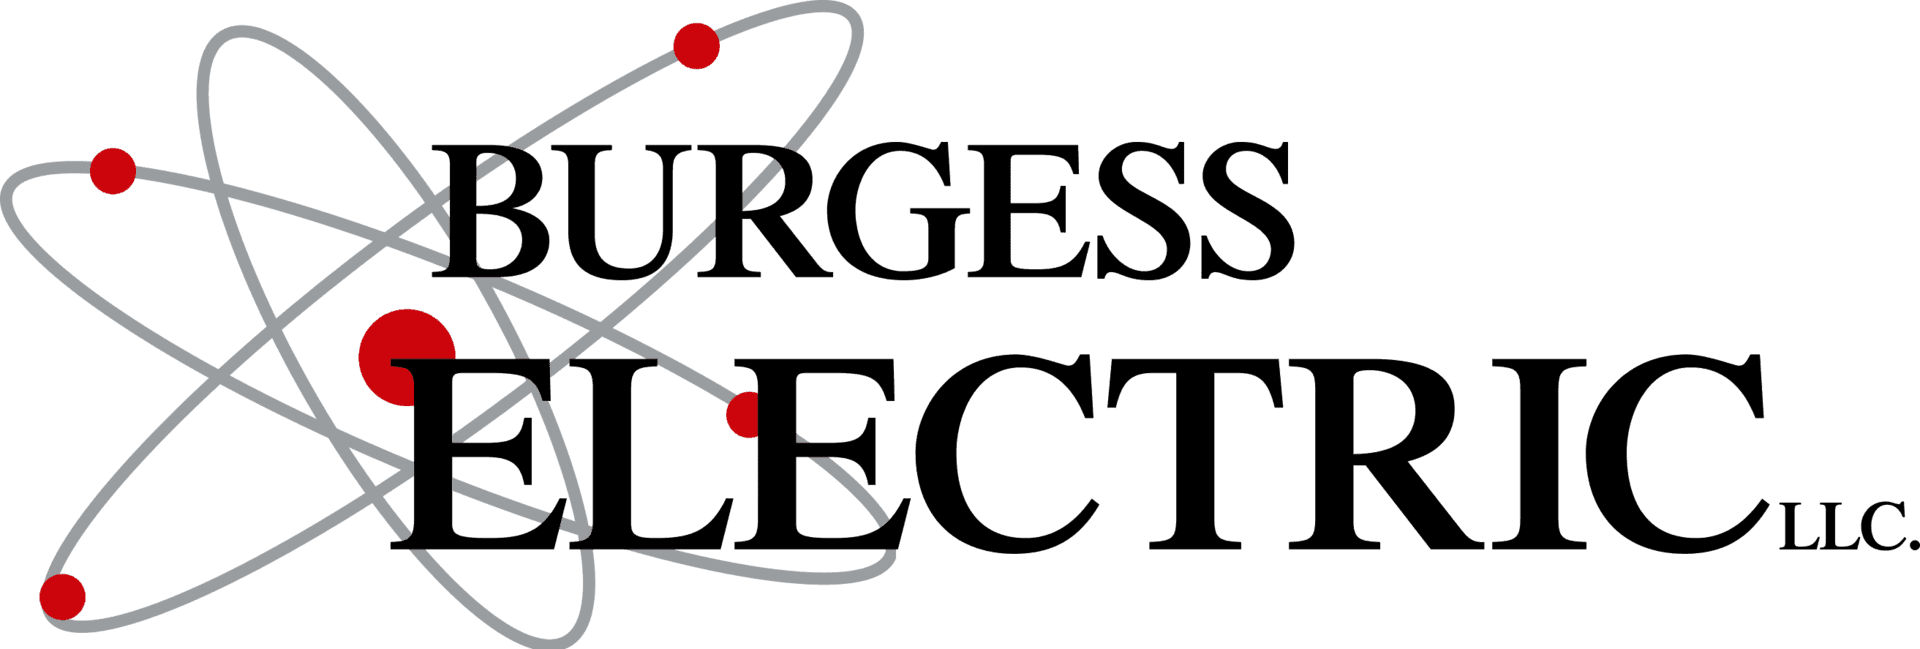 Danger clipart current electricity. Burgess electric llc tucson